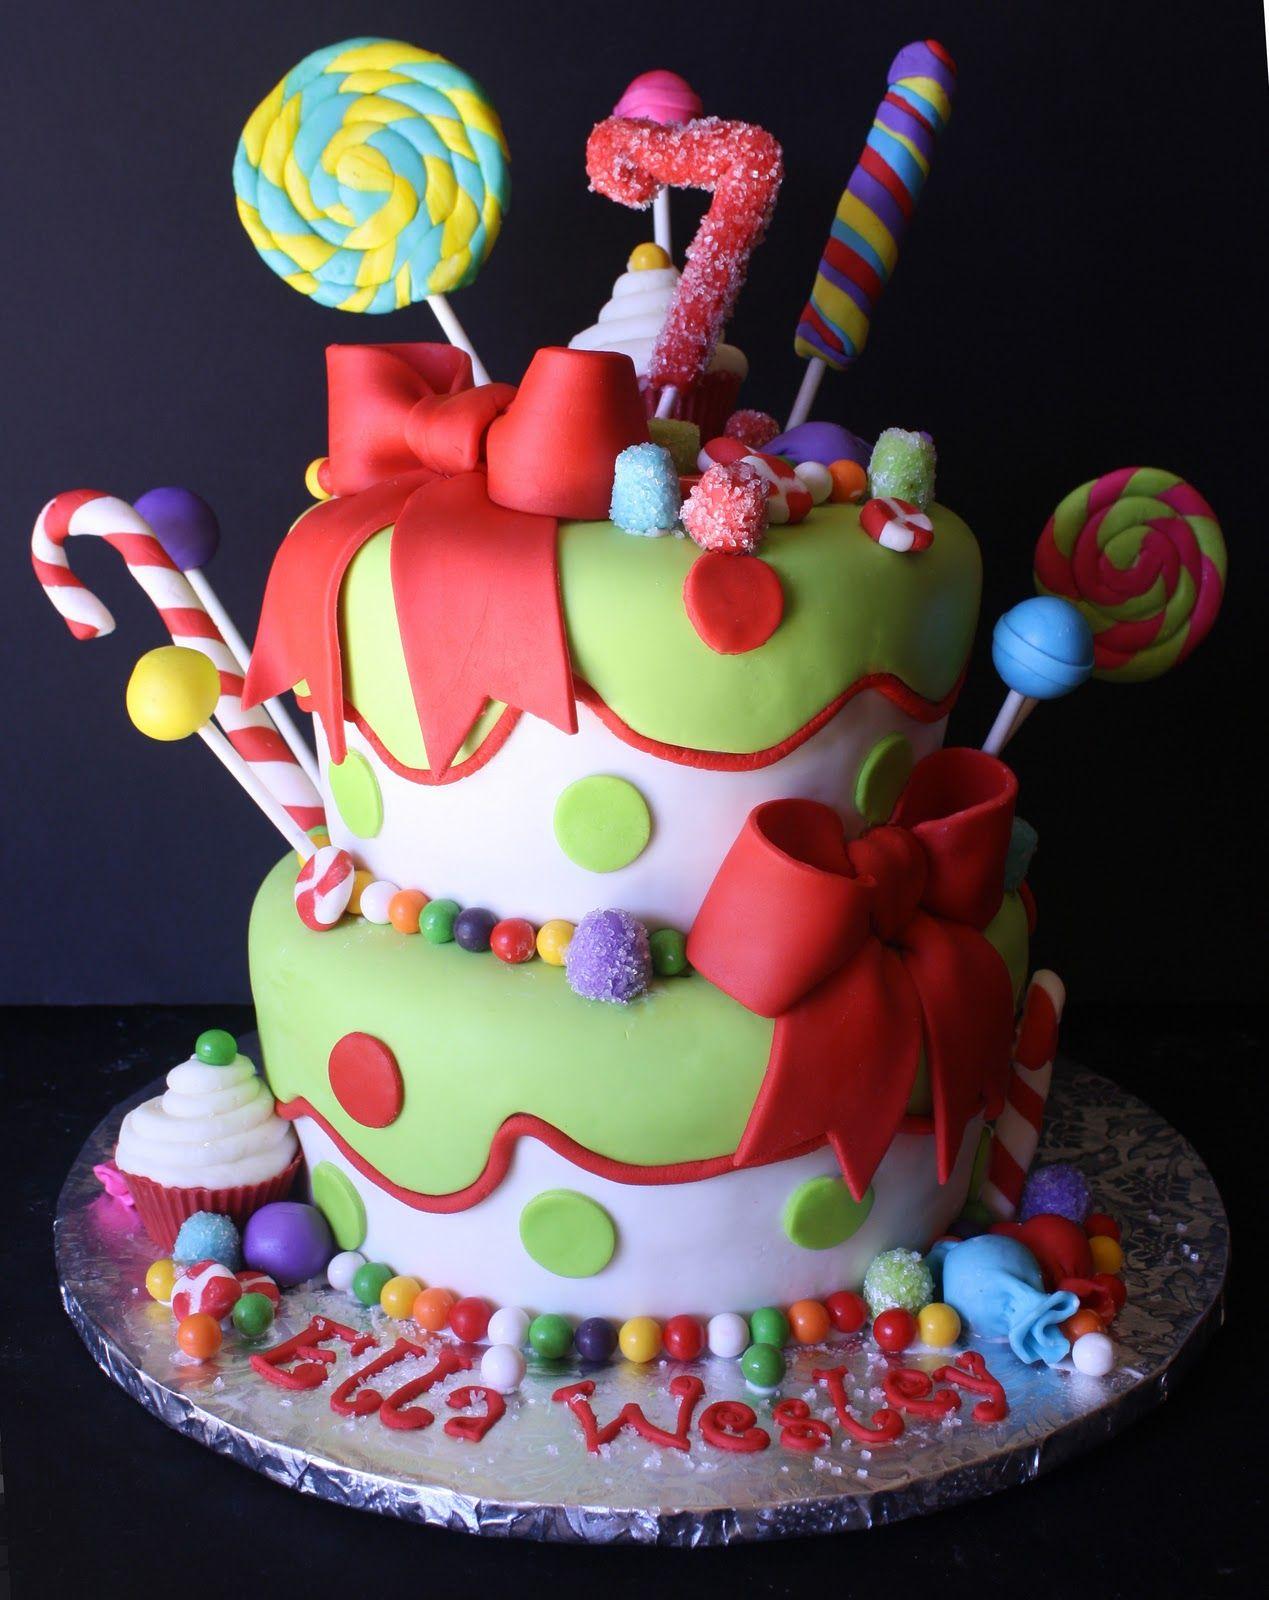 christmas cakes in Savings Rose Bakes A Holly Jolly